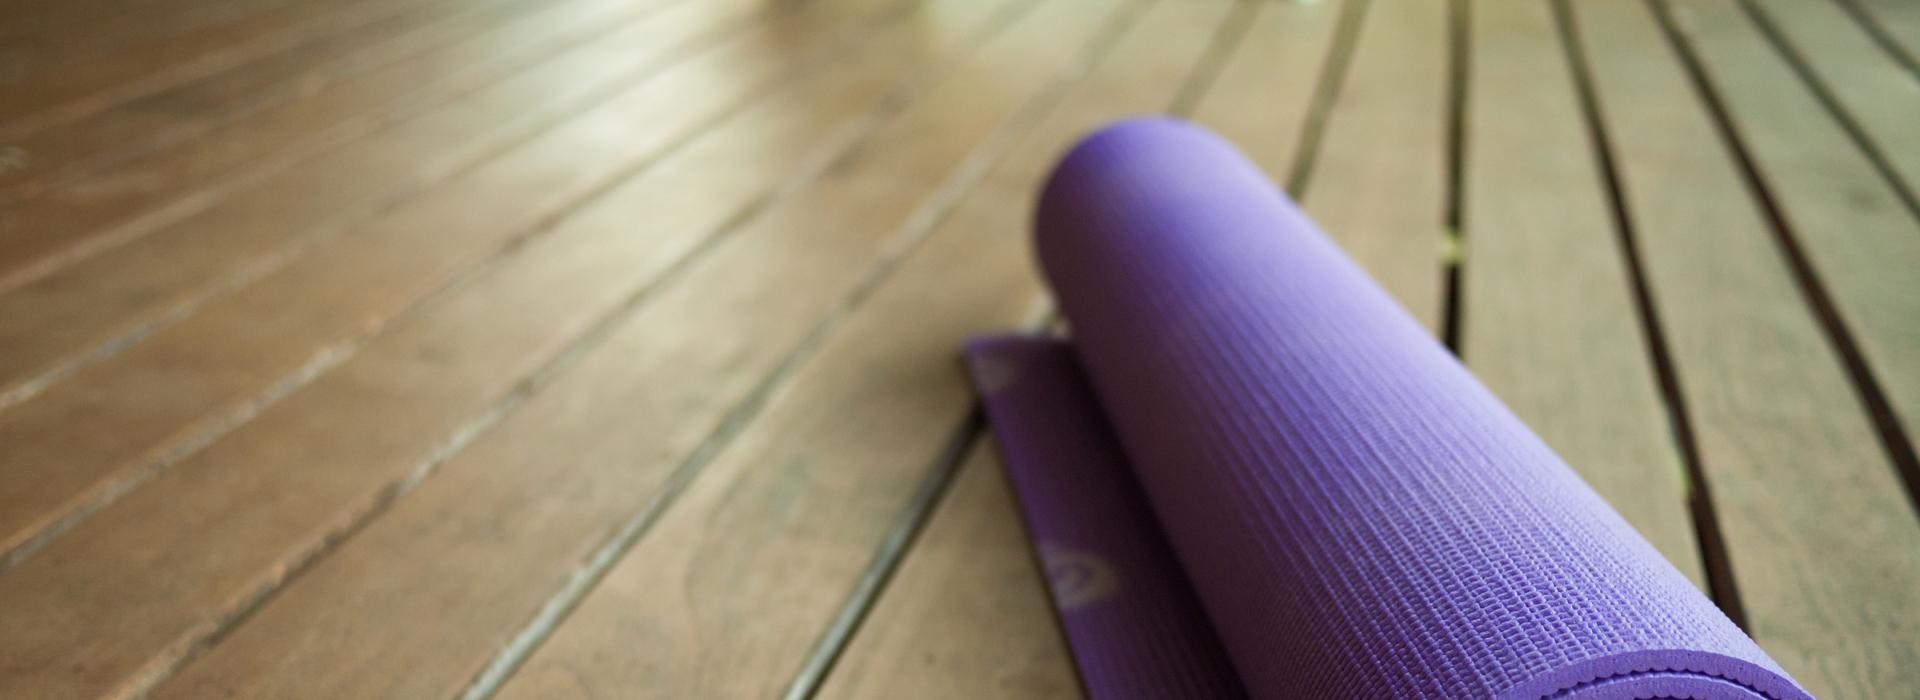 Yoga+Pilates